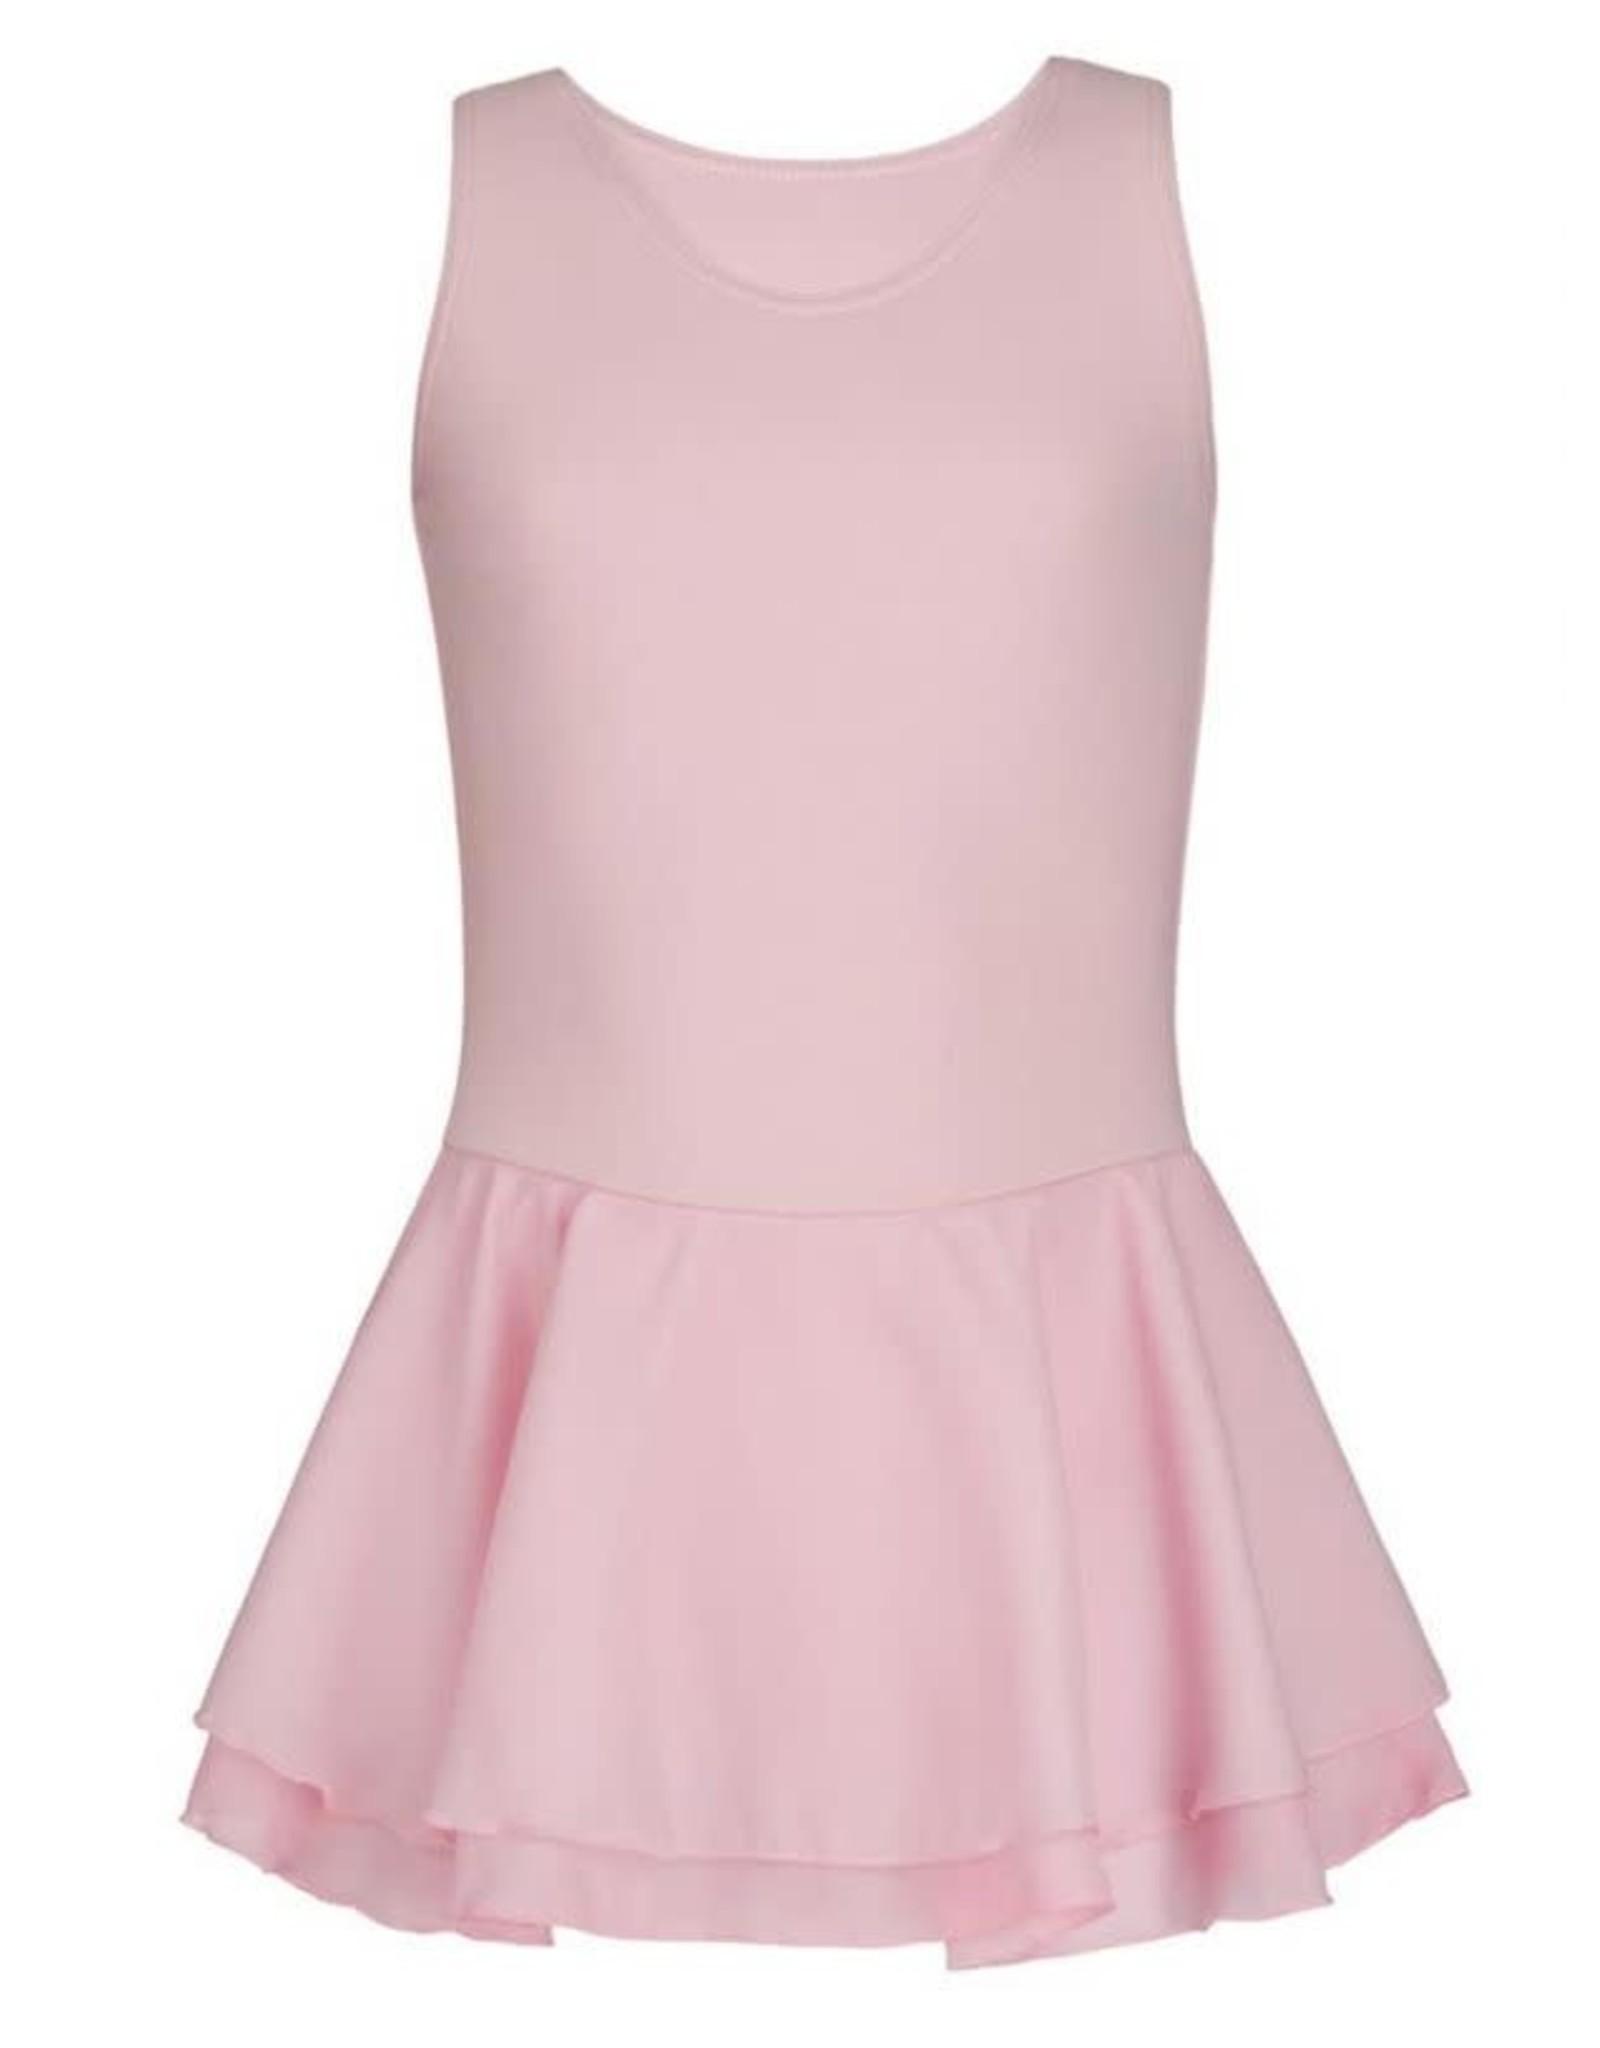 Capezio Double Layer Skirt Tank Dress